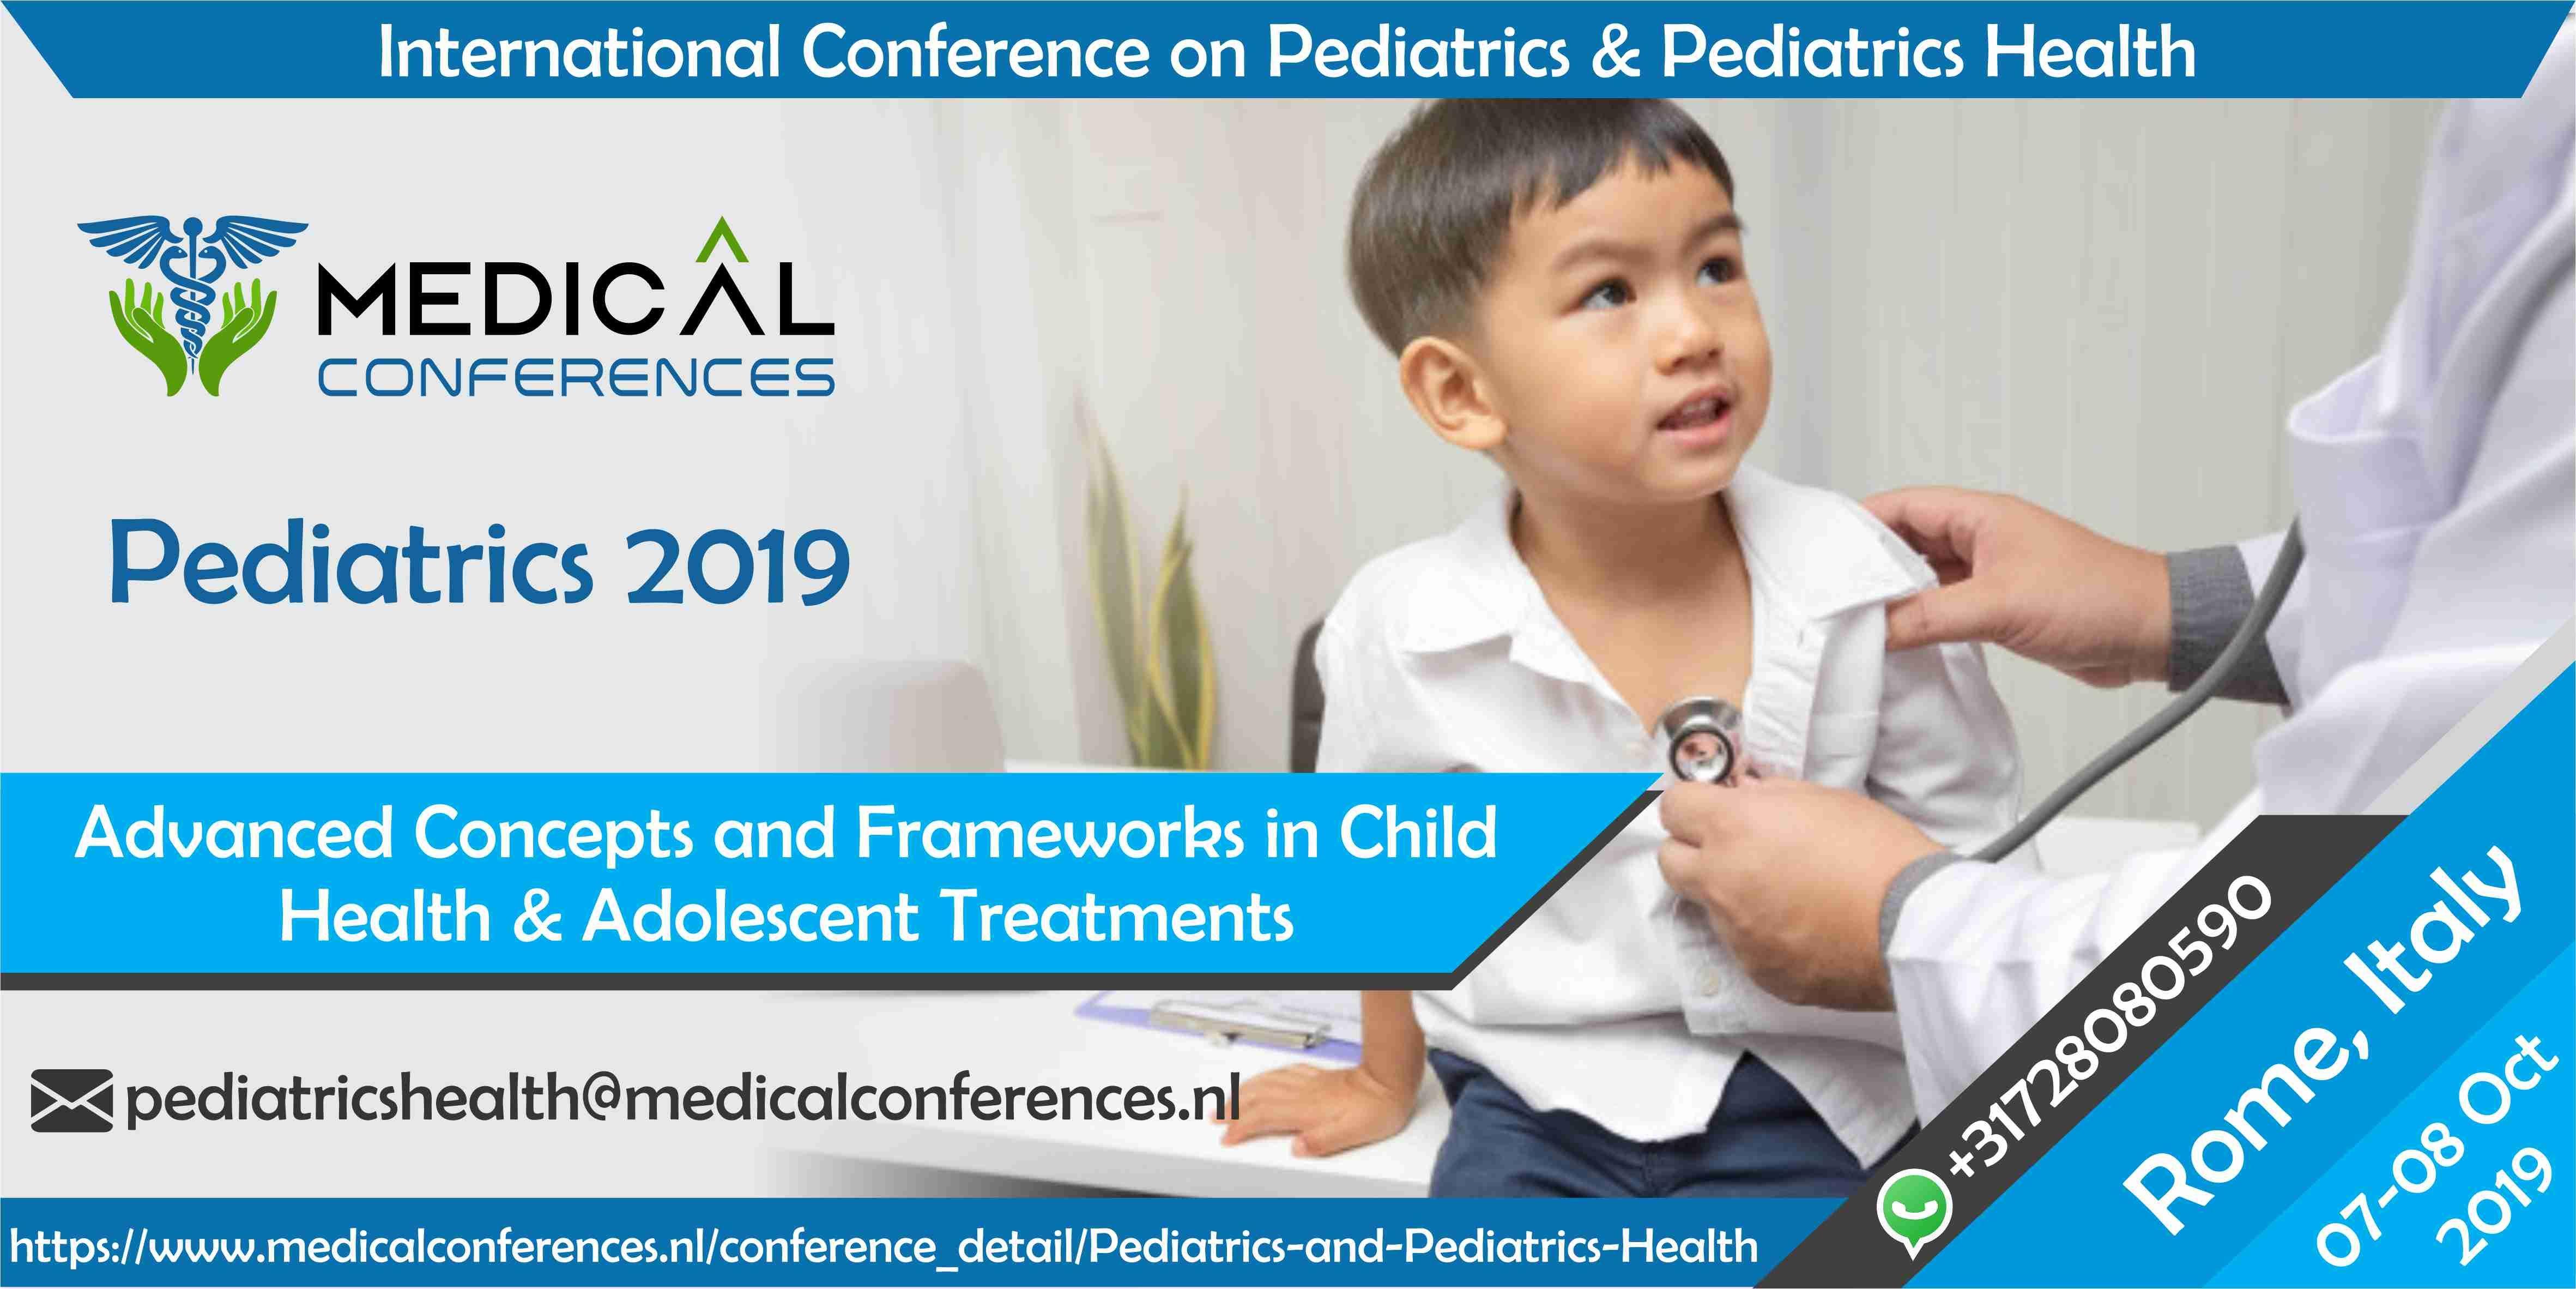 International Conference on Pediatrics & Pediatrics Health October